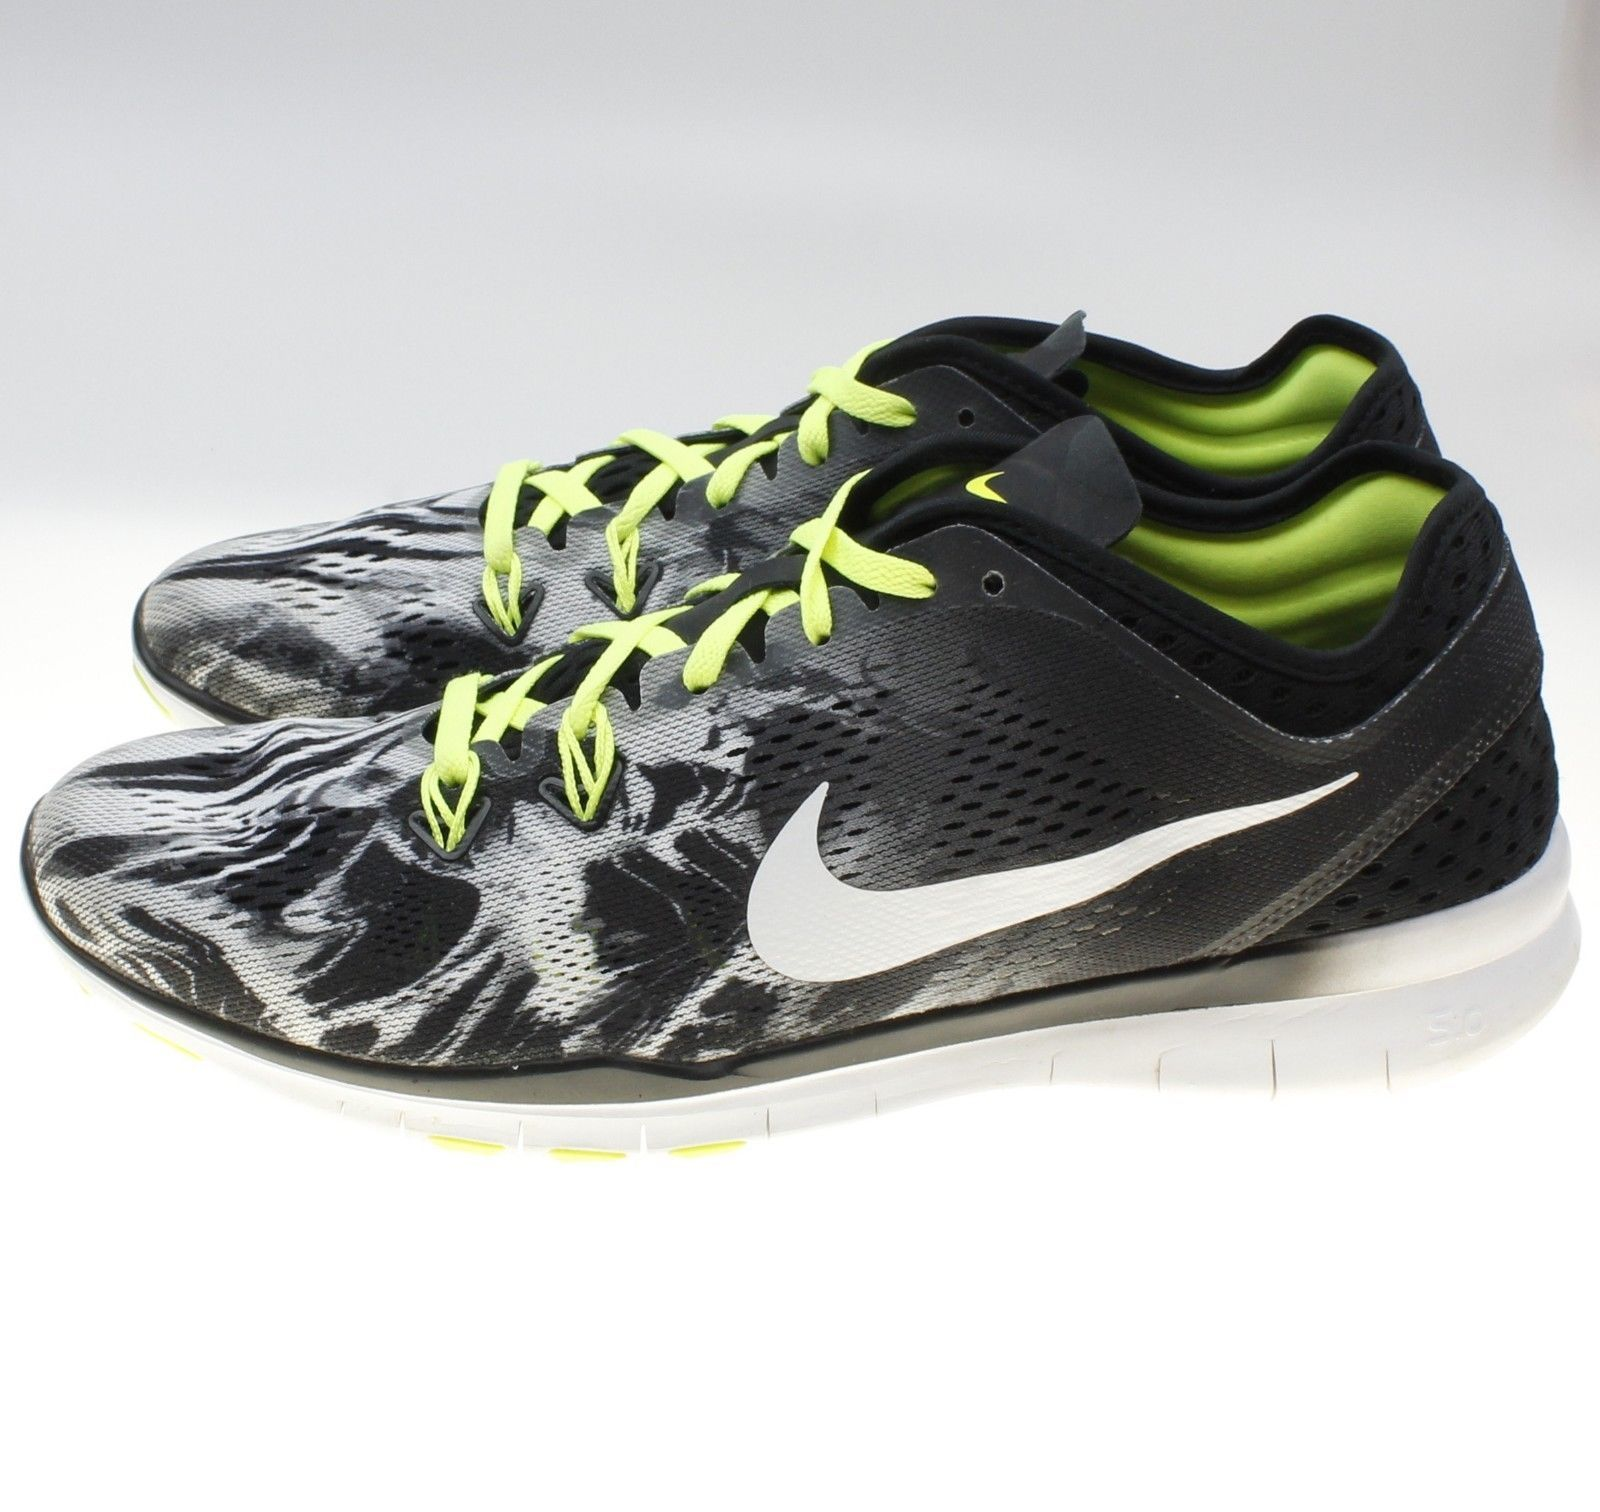 c3134027e2ee9 ... Nike FREE 5.0 TR FIT 5 PRT Running Shoes Black White Volt 704695-014  Size ...